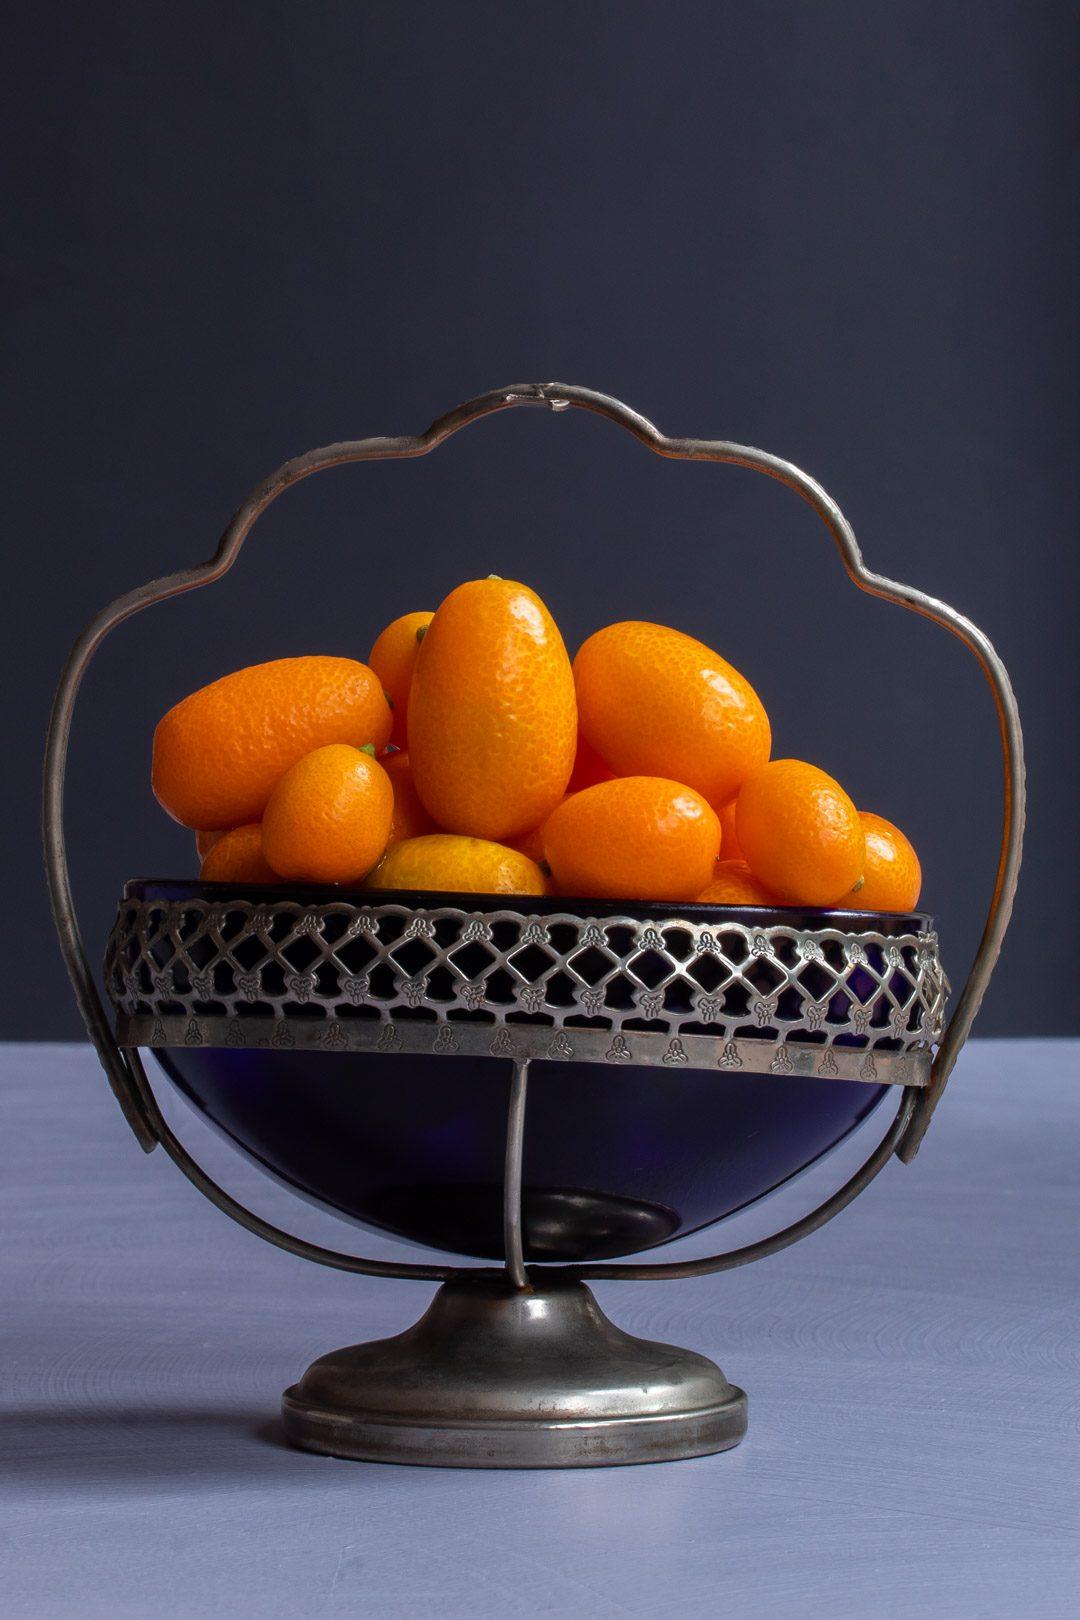 making cumquat brandy with cumquats in vintage blue glass sugar bowl